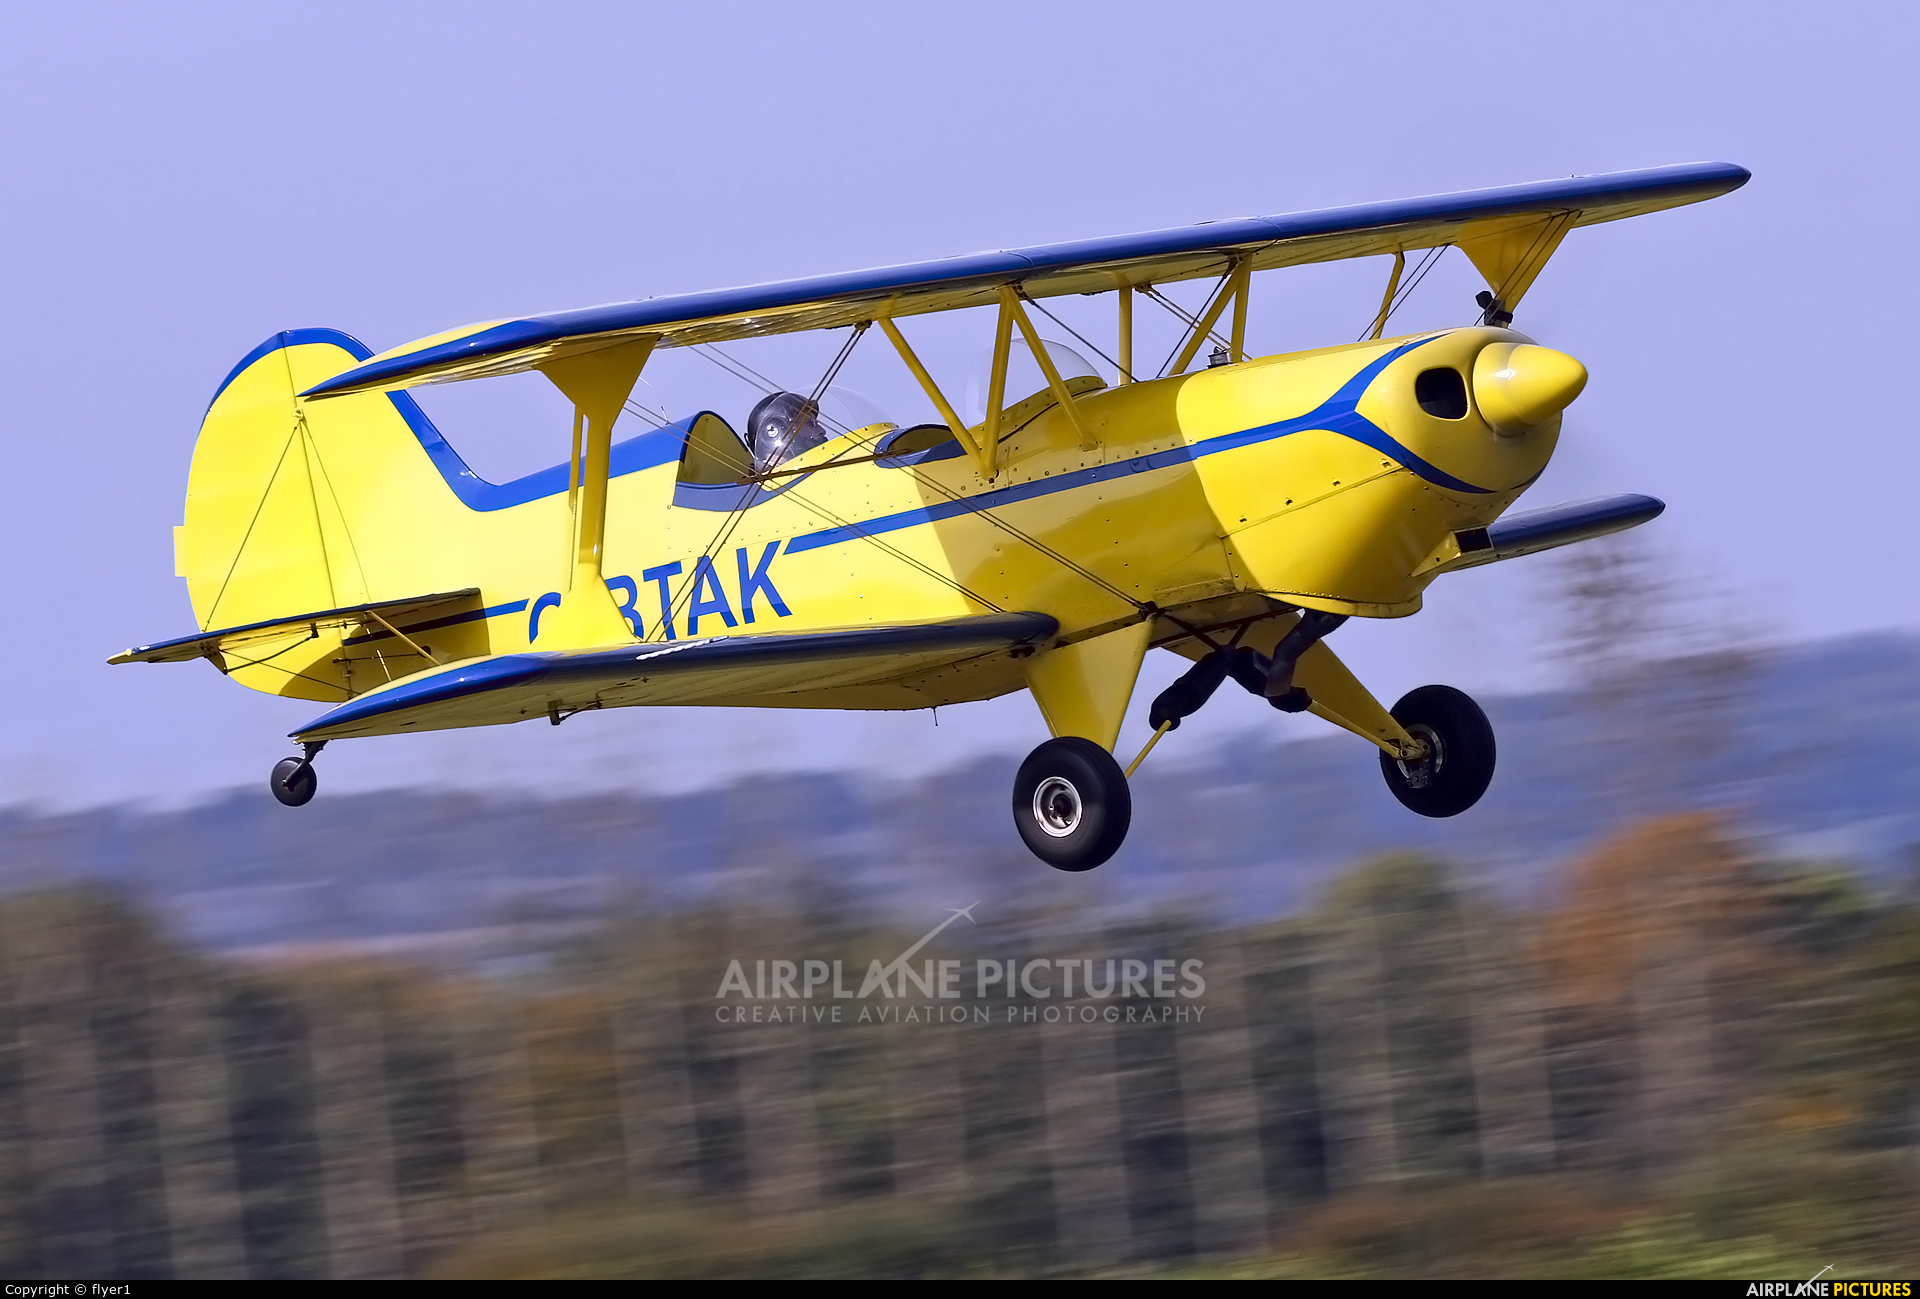 Private G-BTAK aircraft at Lashenden / Headcorn